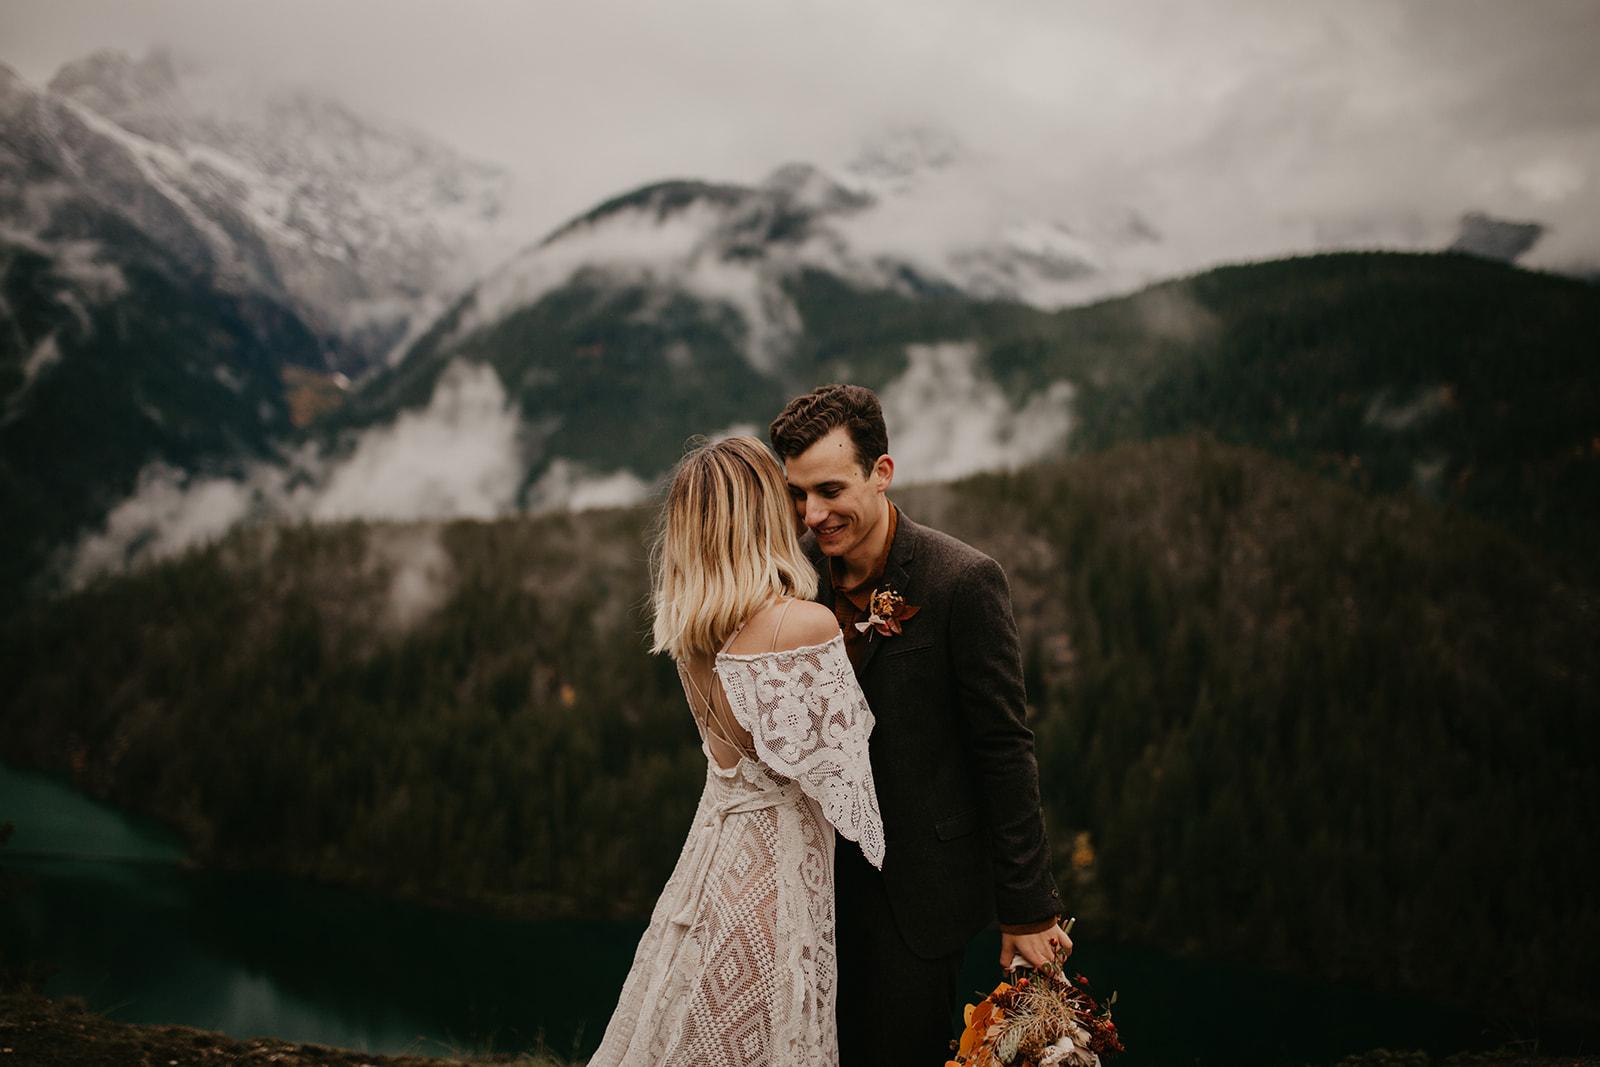 Diablo-lake-elopement-Washington-Northcascades-weddding-boho-adventure-travel-destination-photographer-engagement-pacific-northwest-hannah-alena-photography-Oregon-Idaho-Kauai-Wander-workshopIMG_3297.jpg